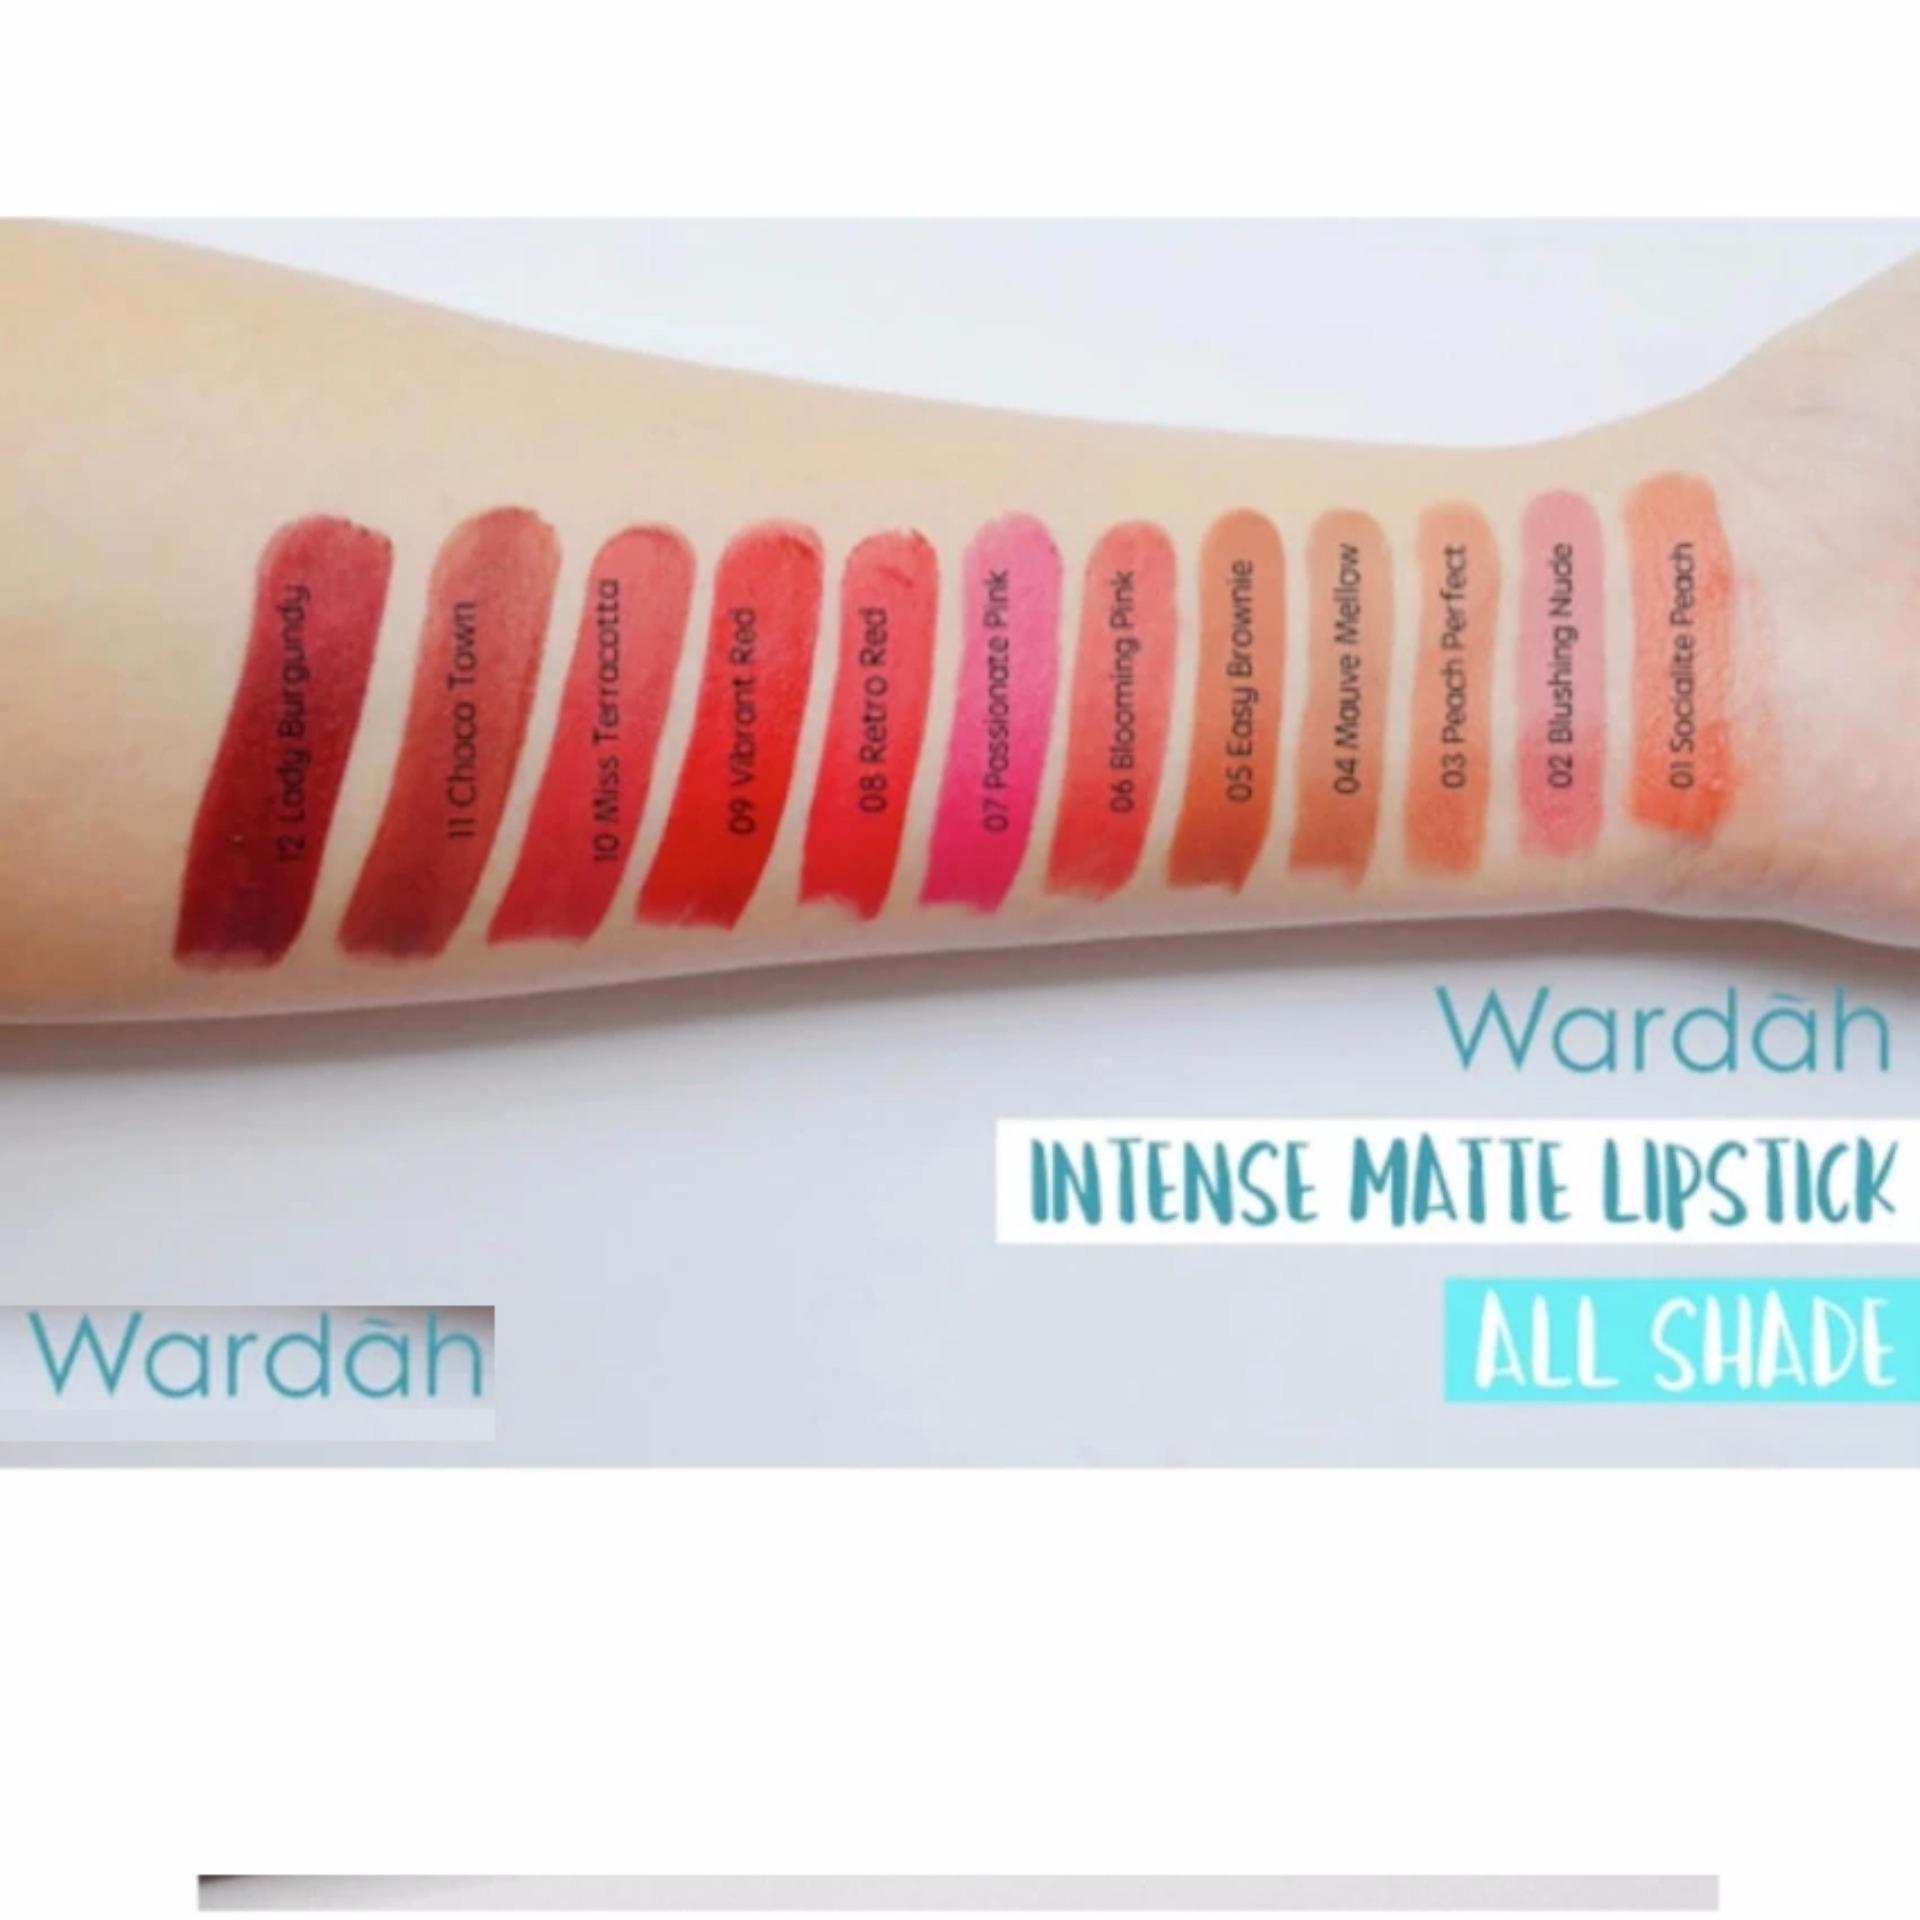 Wardah Intense Matte Lipstick 06 Blooming Pink 2 5gr Daftar Harga Passionate 07 25gr 05 Easy Brownie